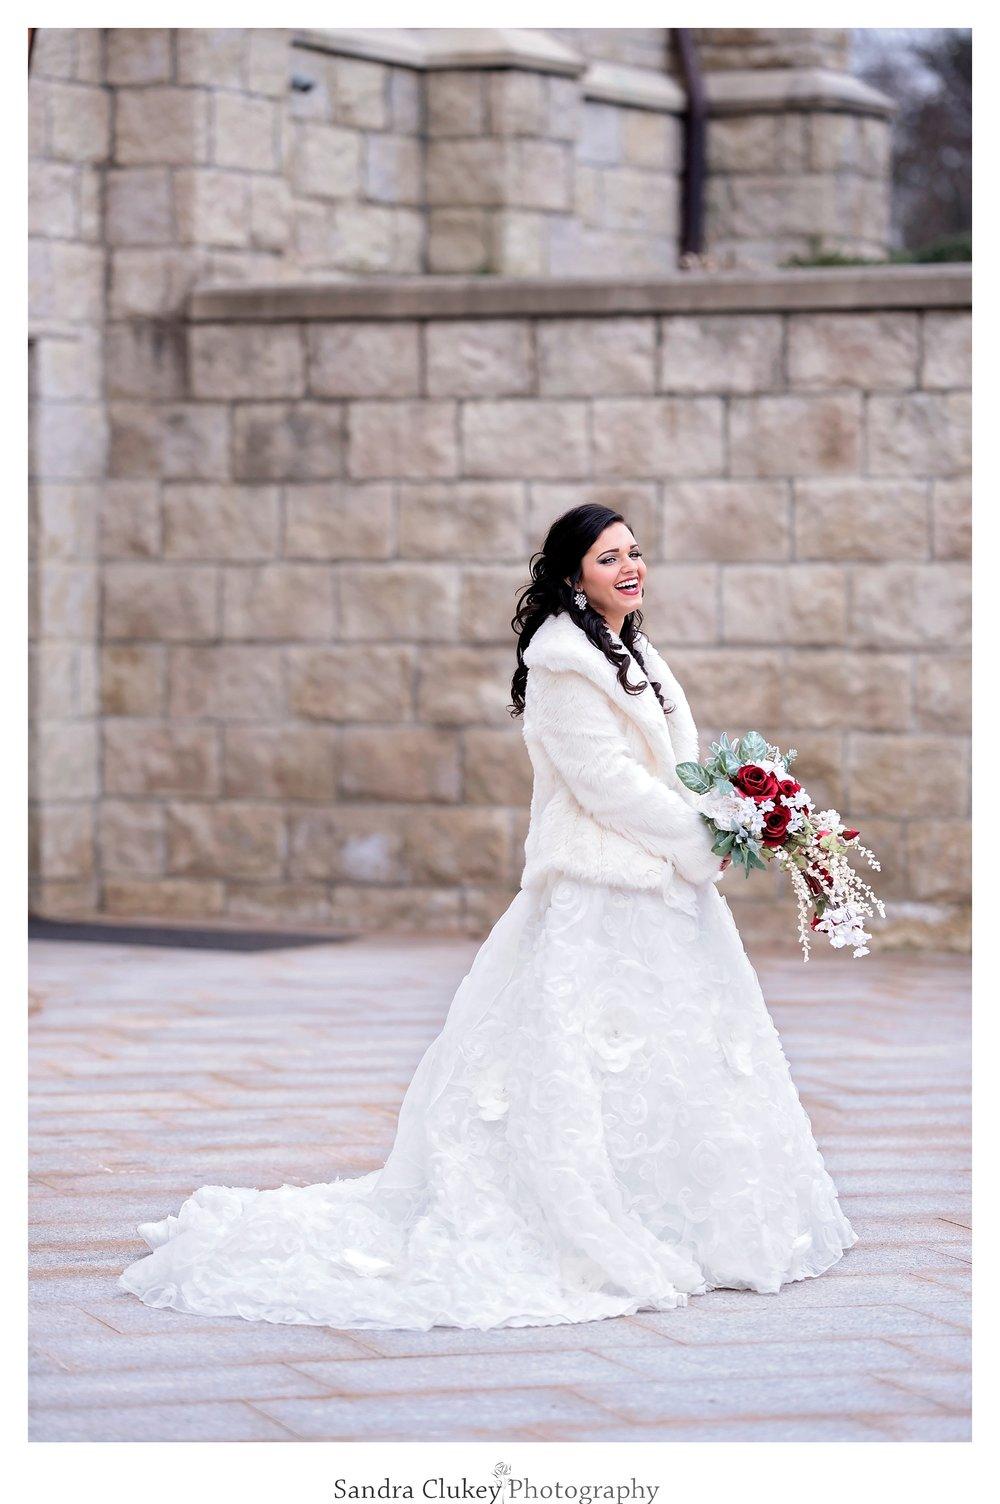 Lee University Chapel, Cleveland TN. Striking Bridal Image